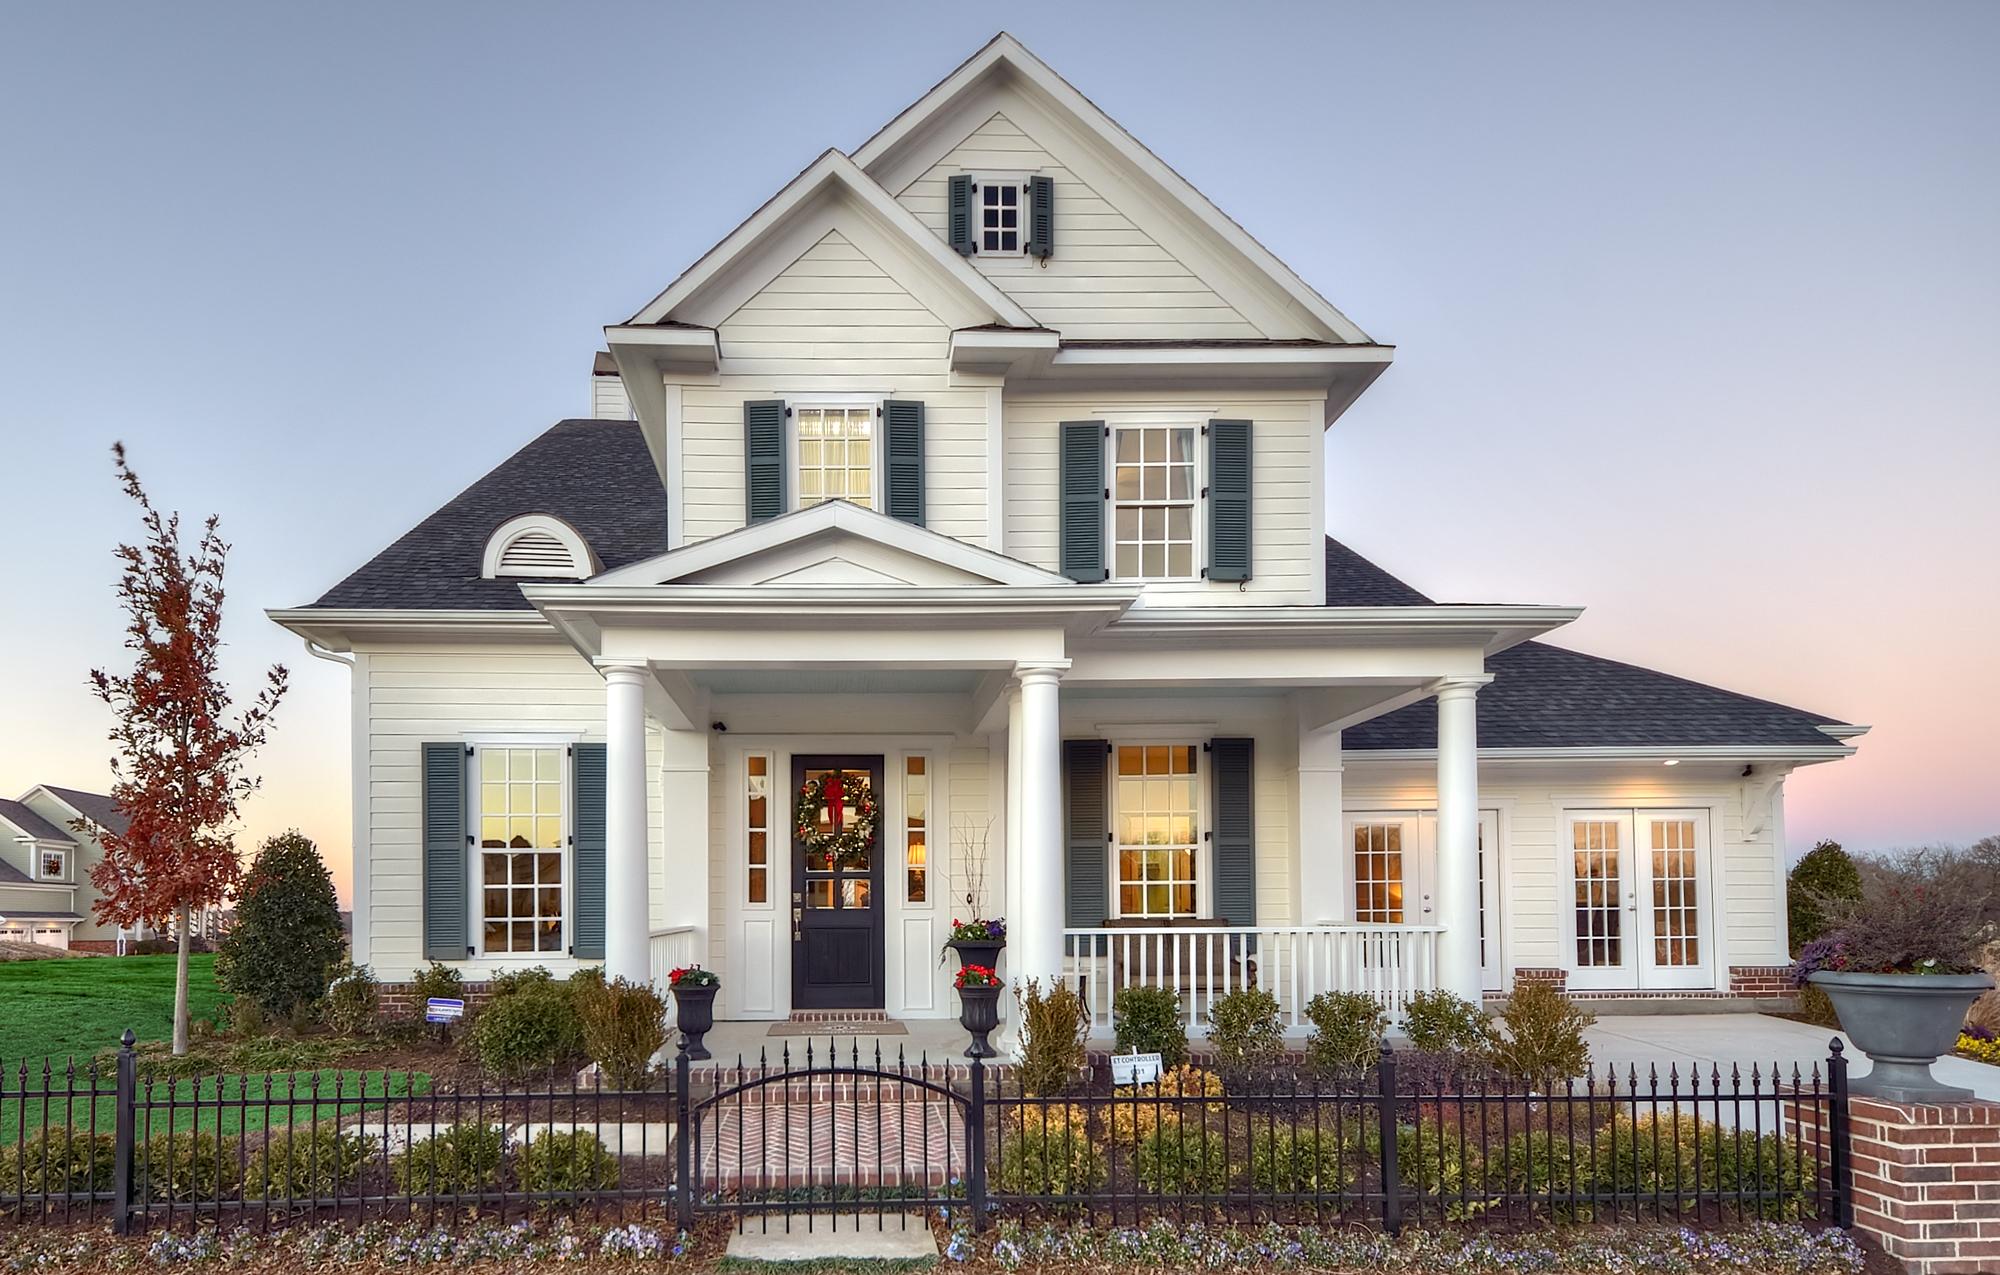 American Home Design Inspiration – HomesFeed